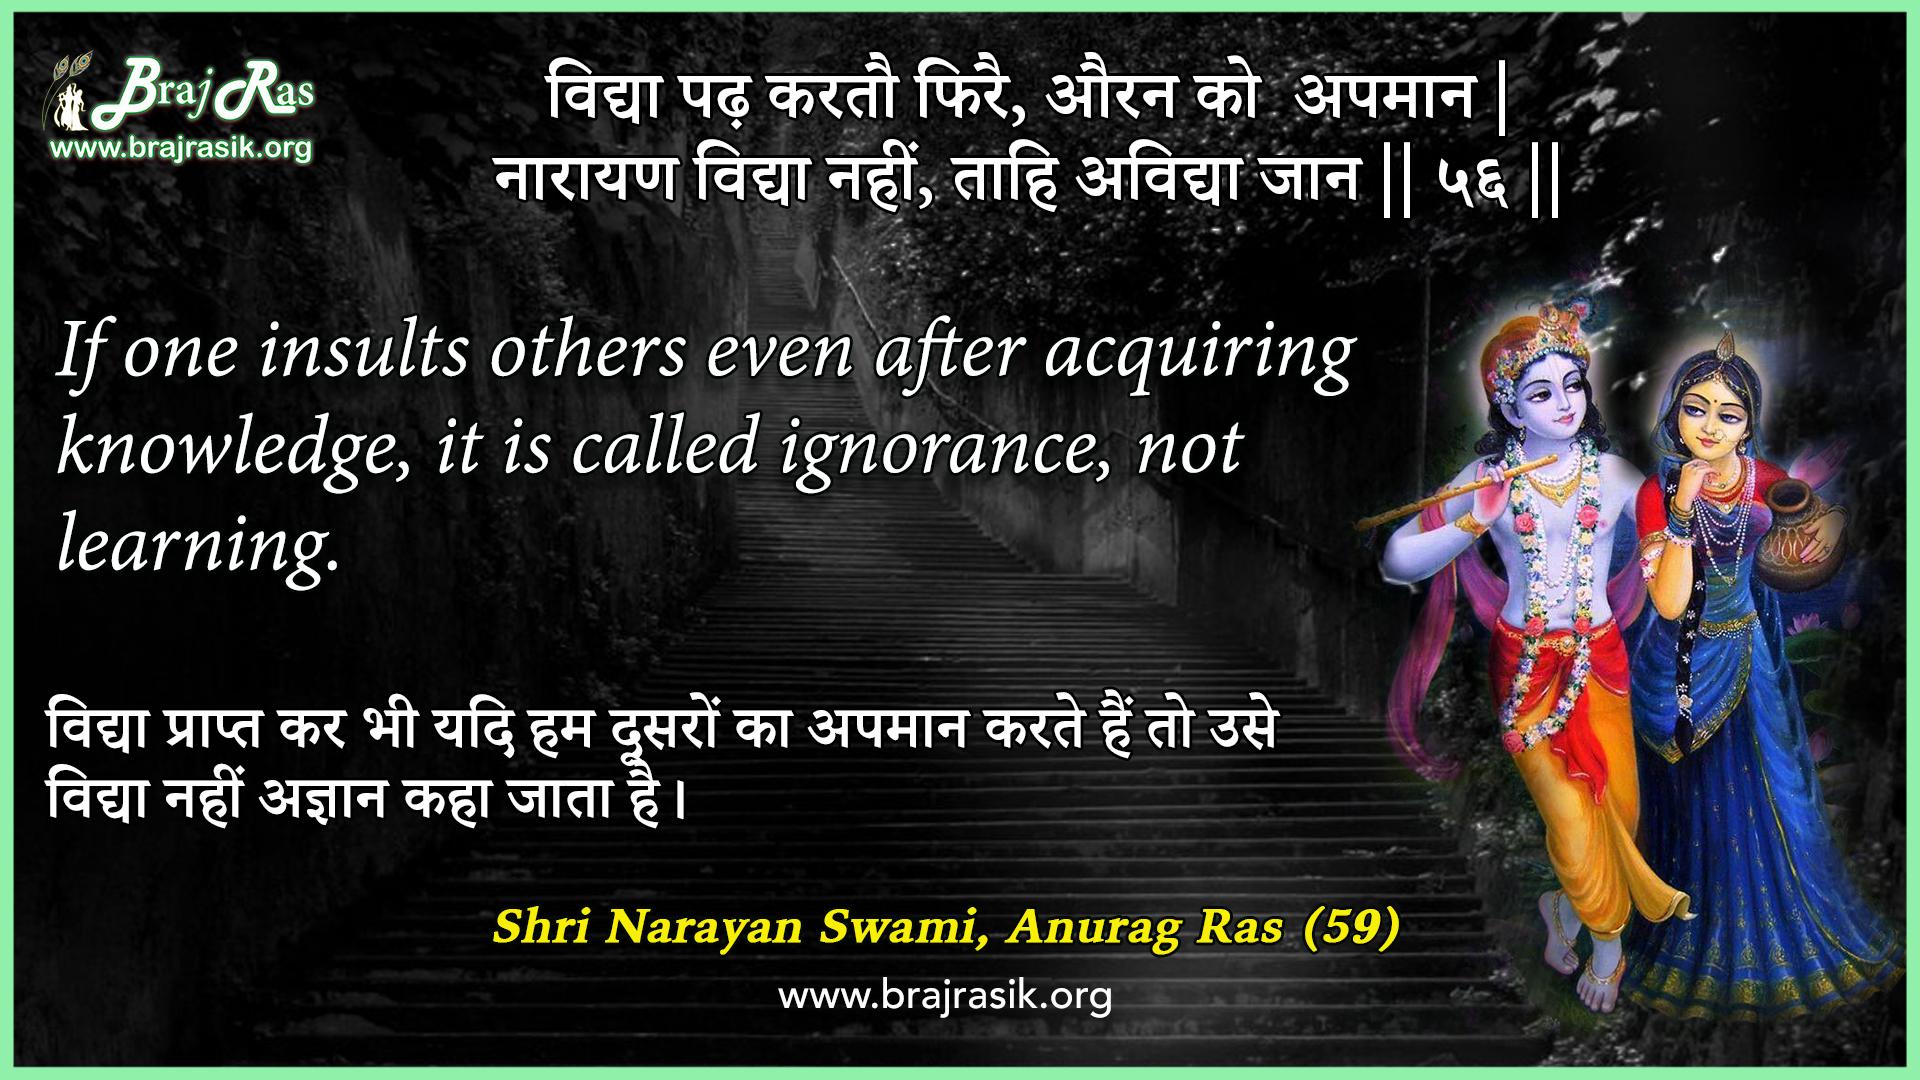 Vidya Padh Karto Fire - Shri Narayan Swami, Anurag Ras